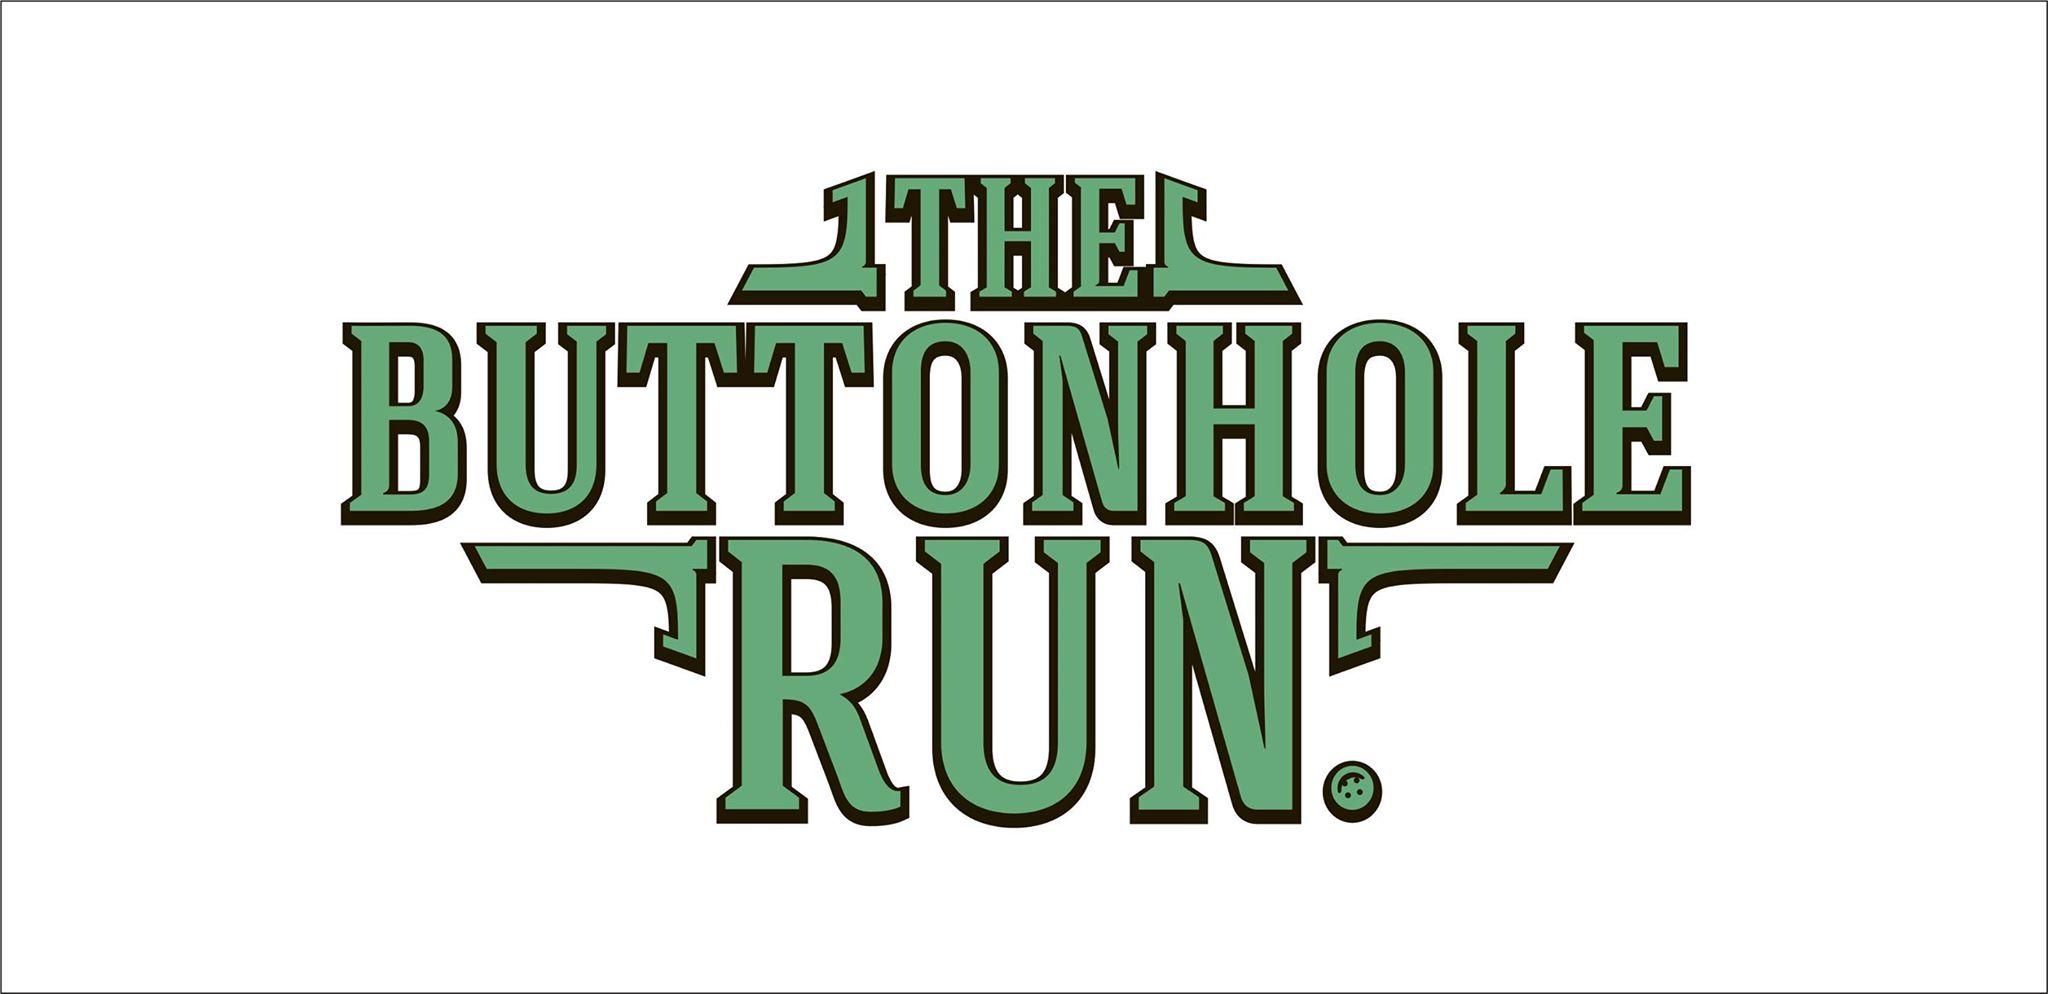 The Buttonhole Run